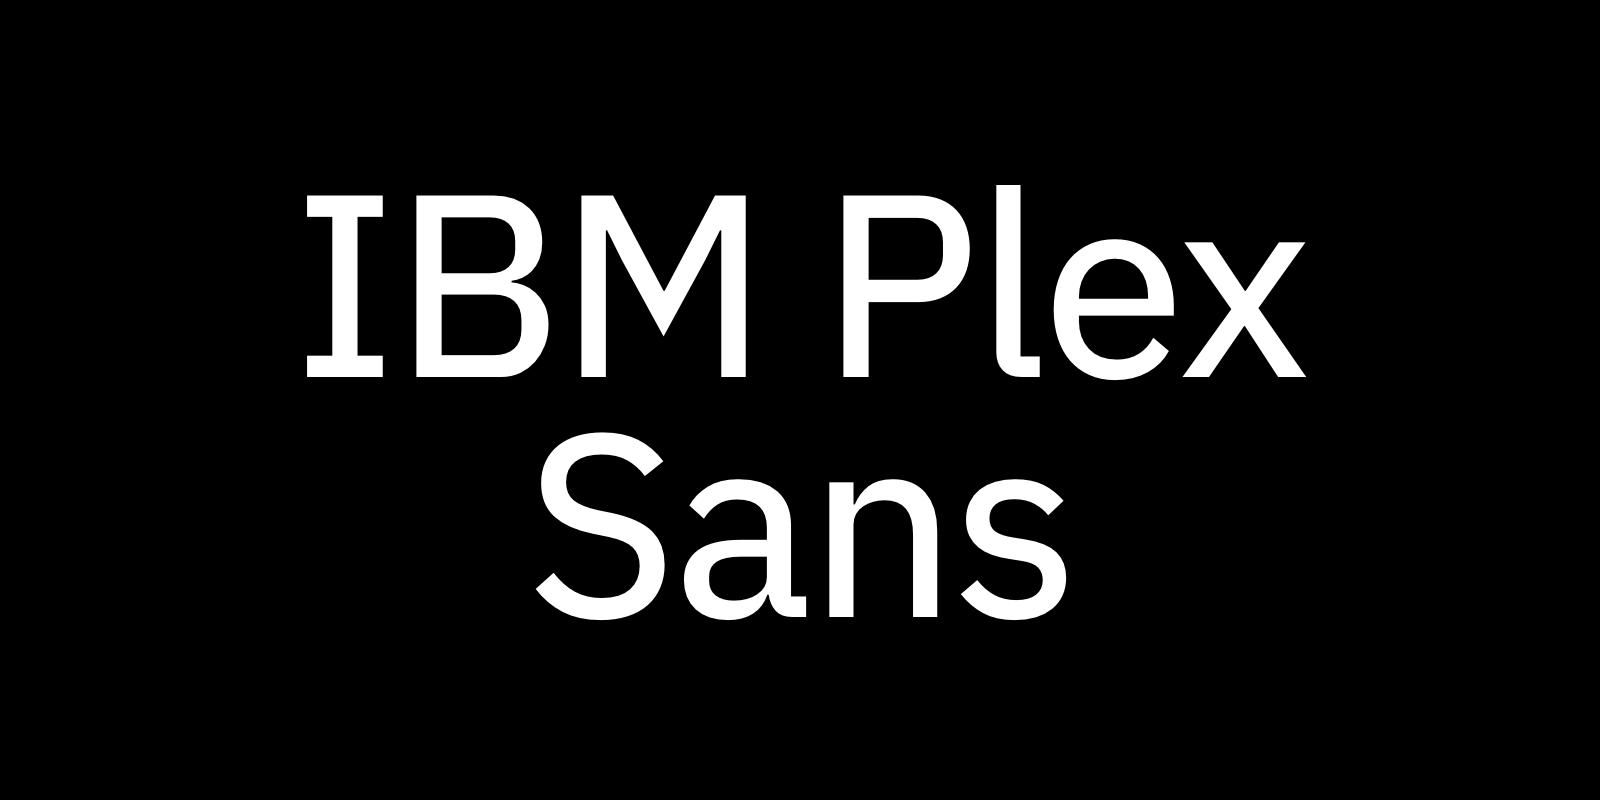 Complete Guide to IBM Plex Sans • Beautiful Web Type